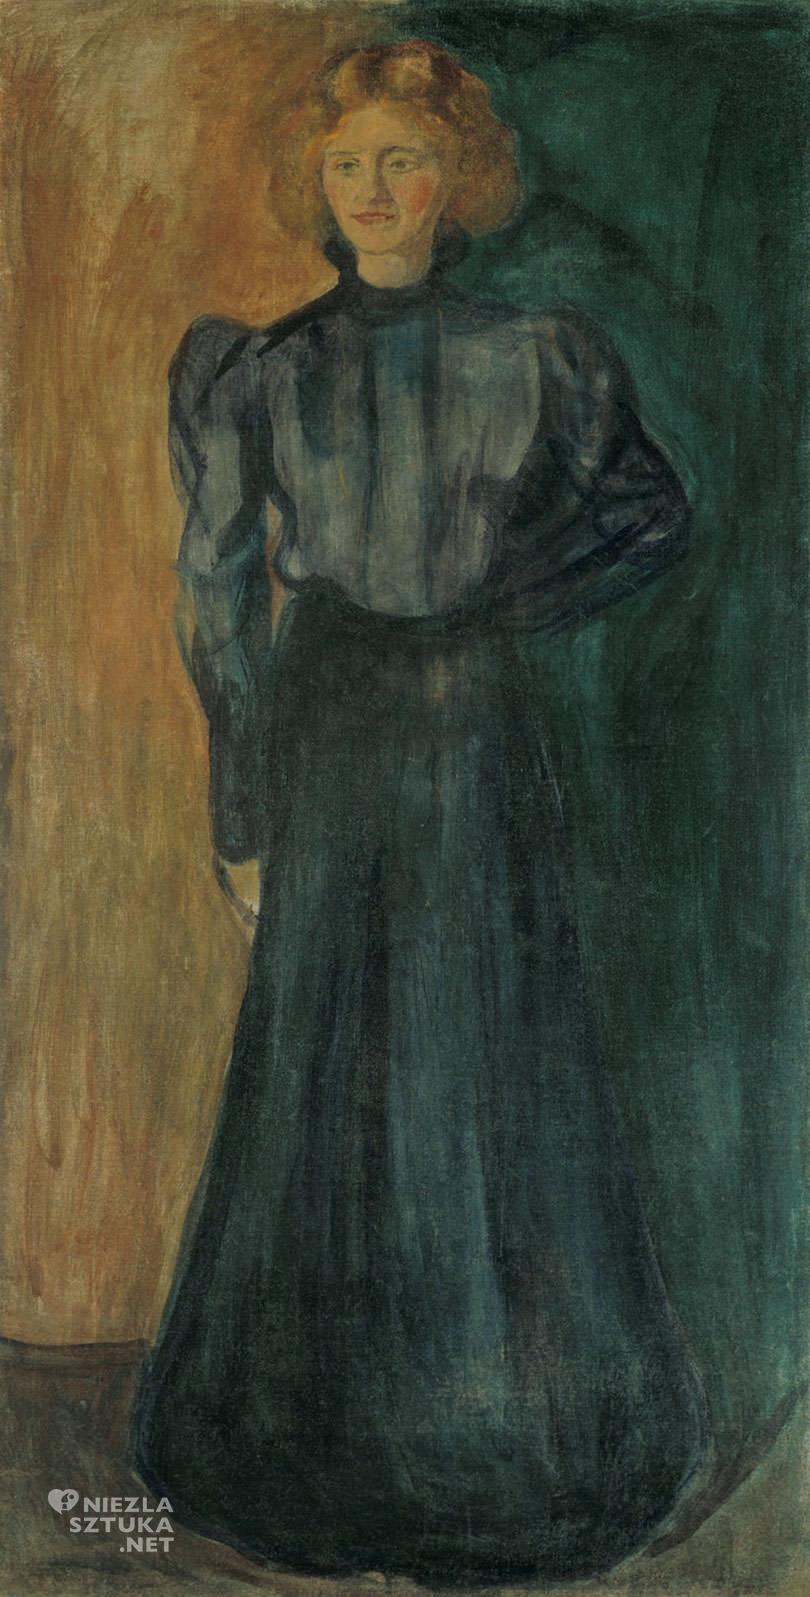 Tulla Larsen, Edvard Munch, Niezła sztuka